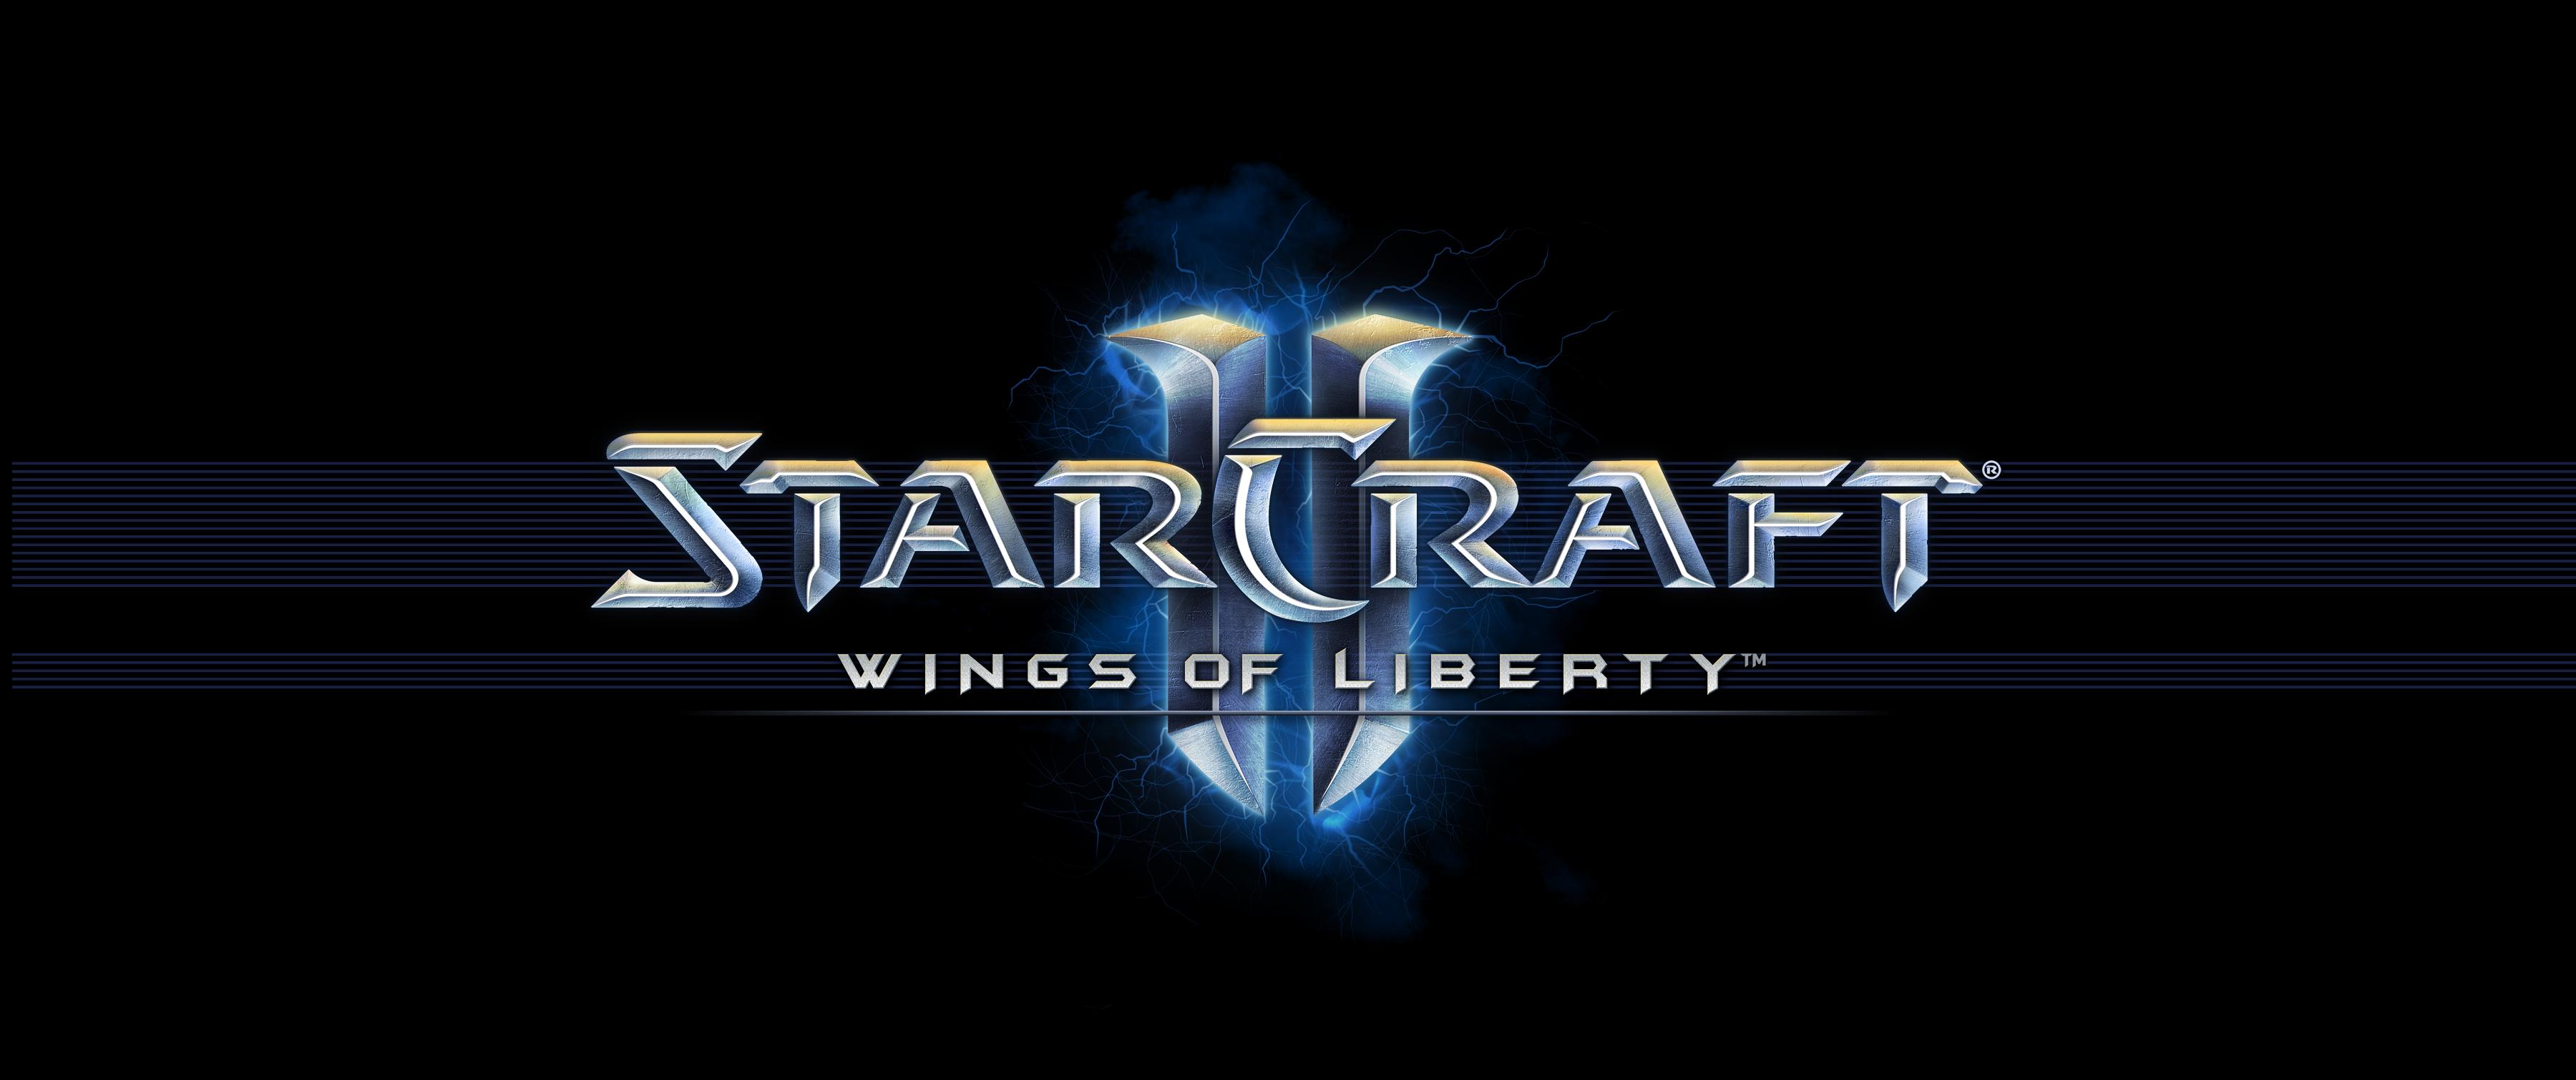 Imágenes Inéditas de Starcraft 2!!!